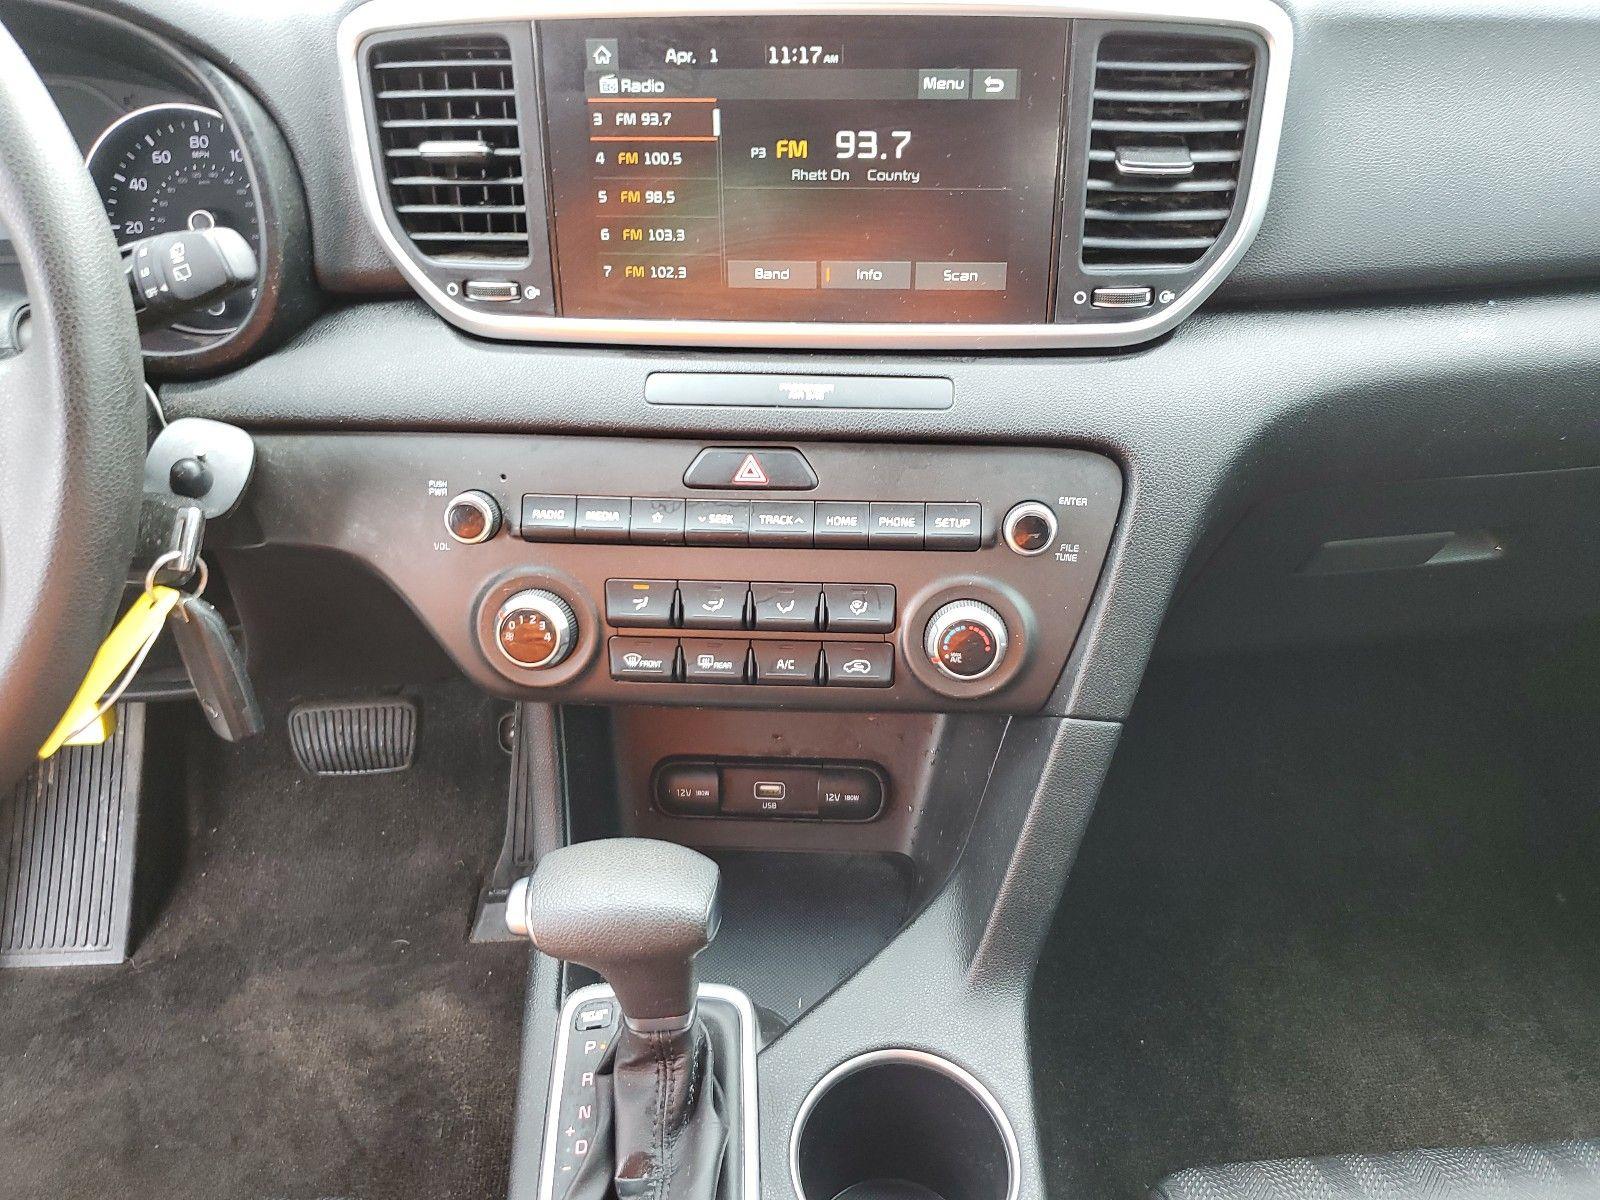 2020 KIA SPORTAGE FWD 4C LX - 11